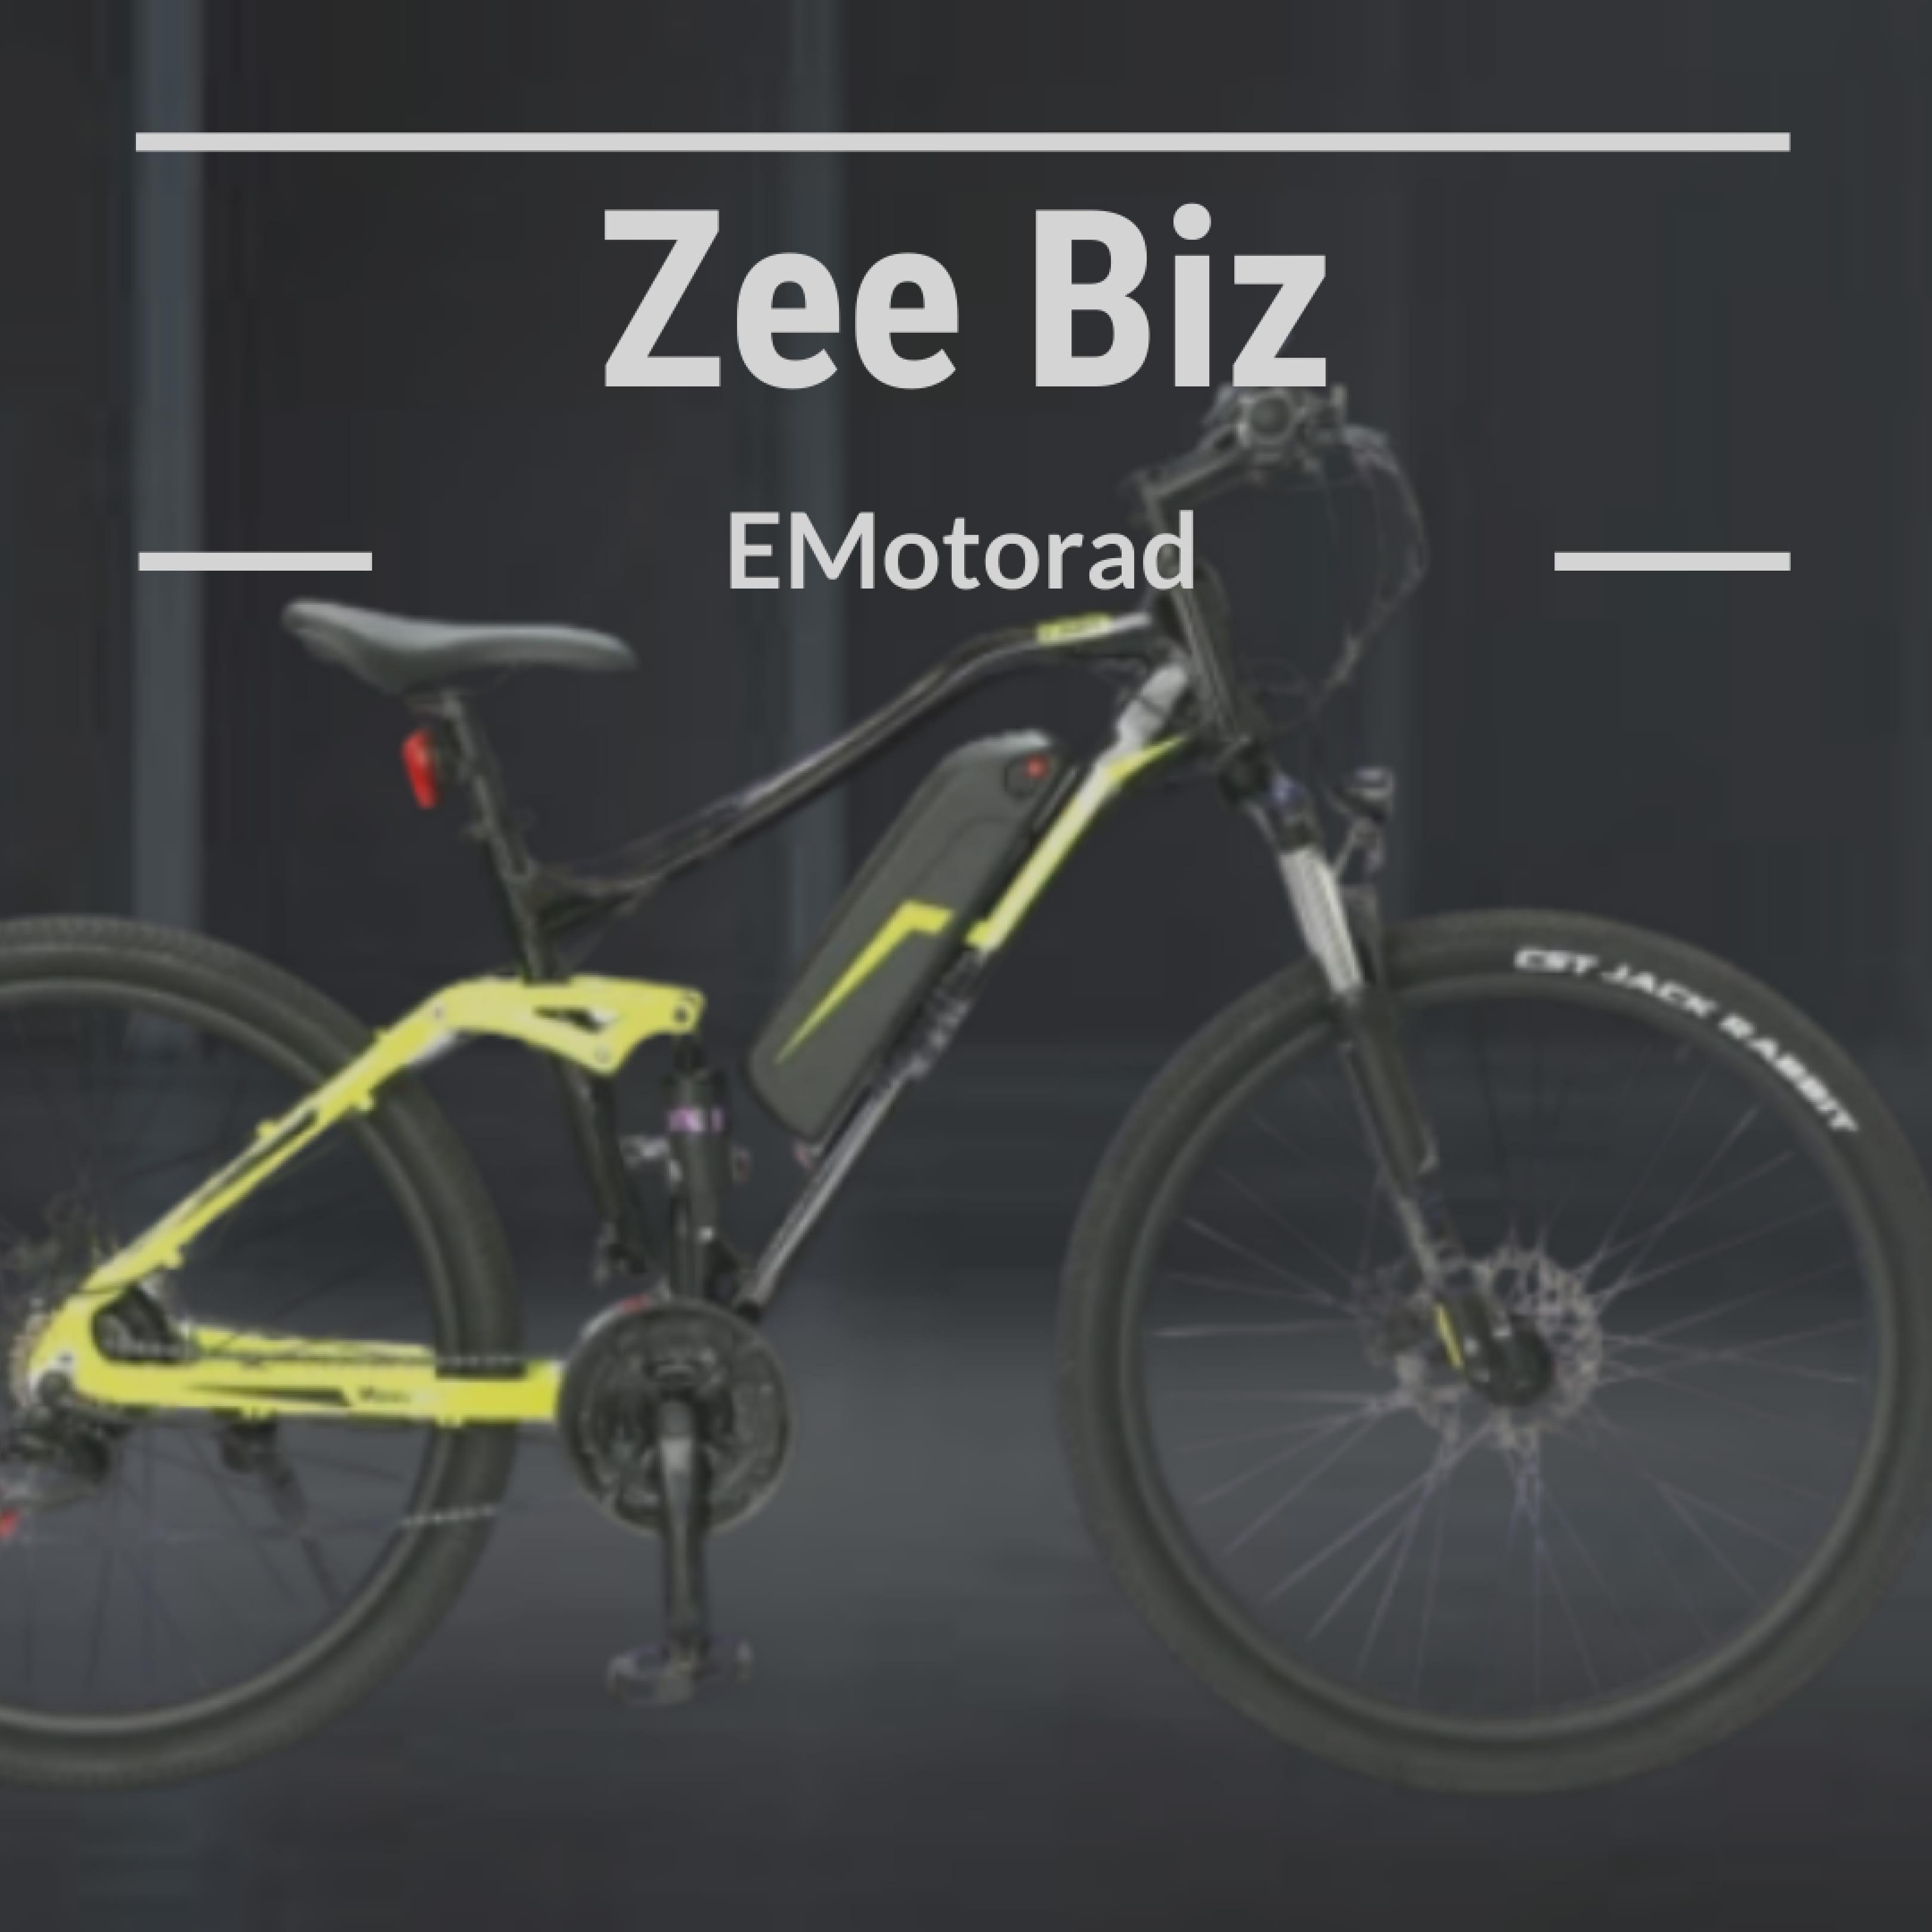 Zee Biz